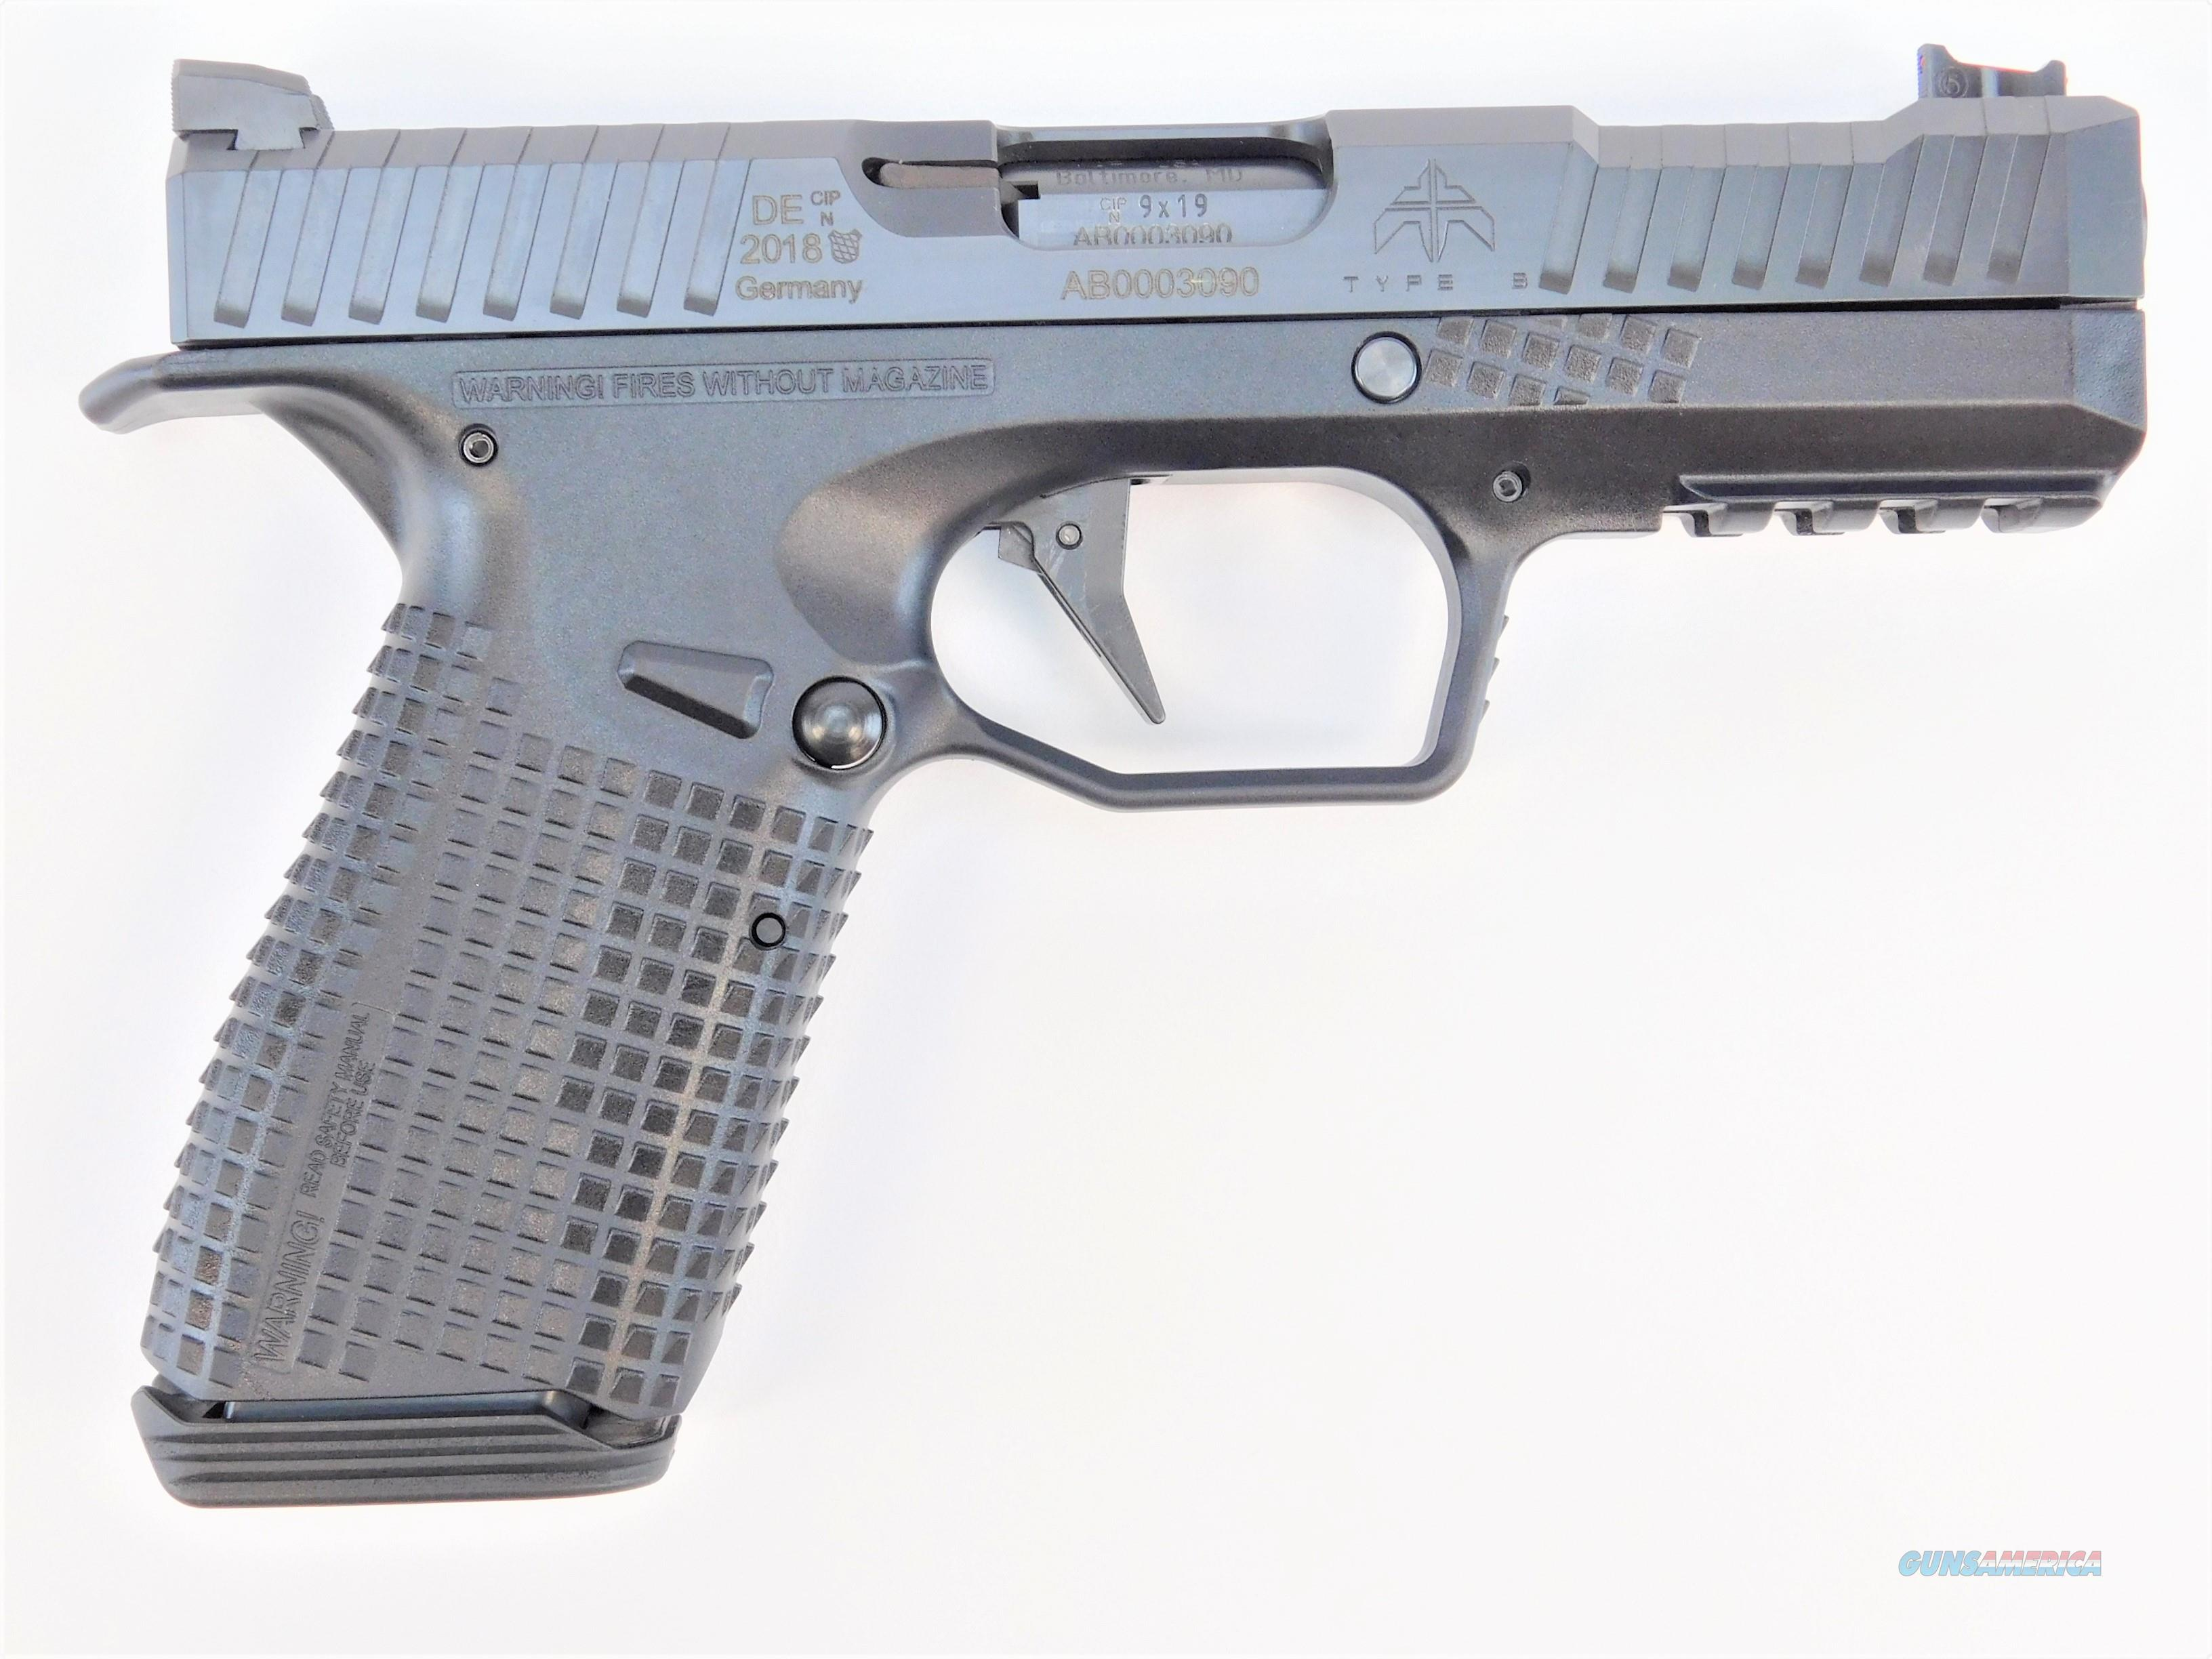 "Archon Firearms Type B 9mm 4.29"" 15 Rounds TYPEB  Guns > Pistols > A Misc Pistols"